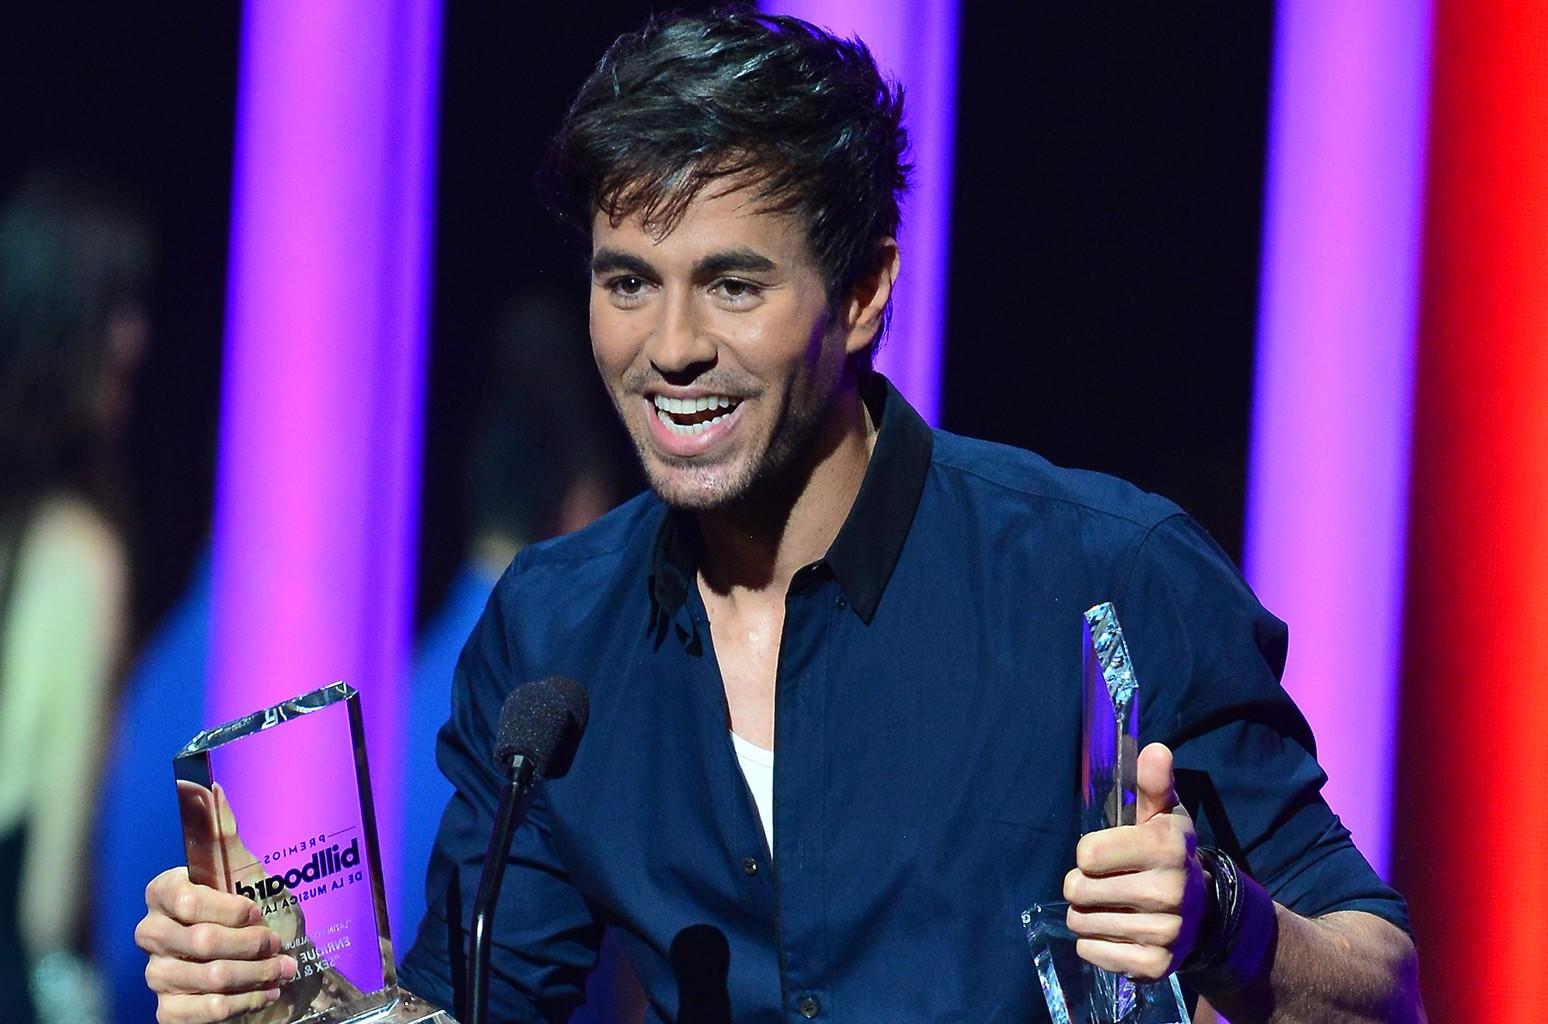 Enrique Iglesias during the 2015 Billboard Latin Music Awards